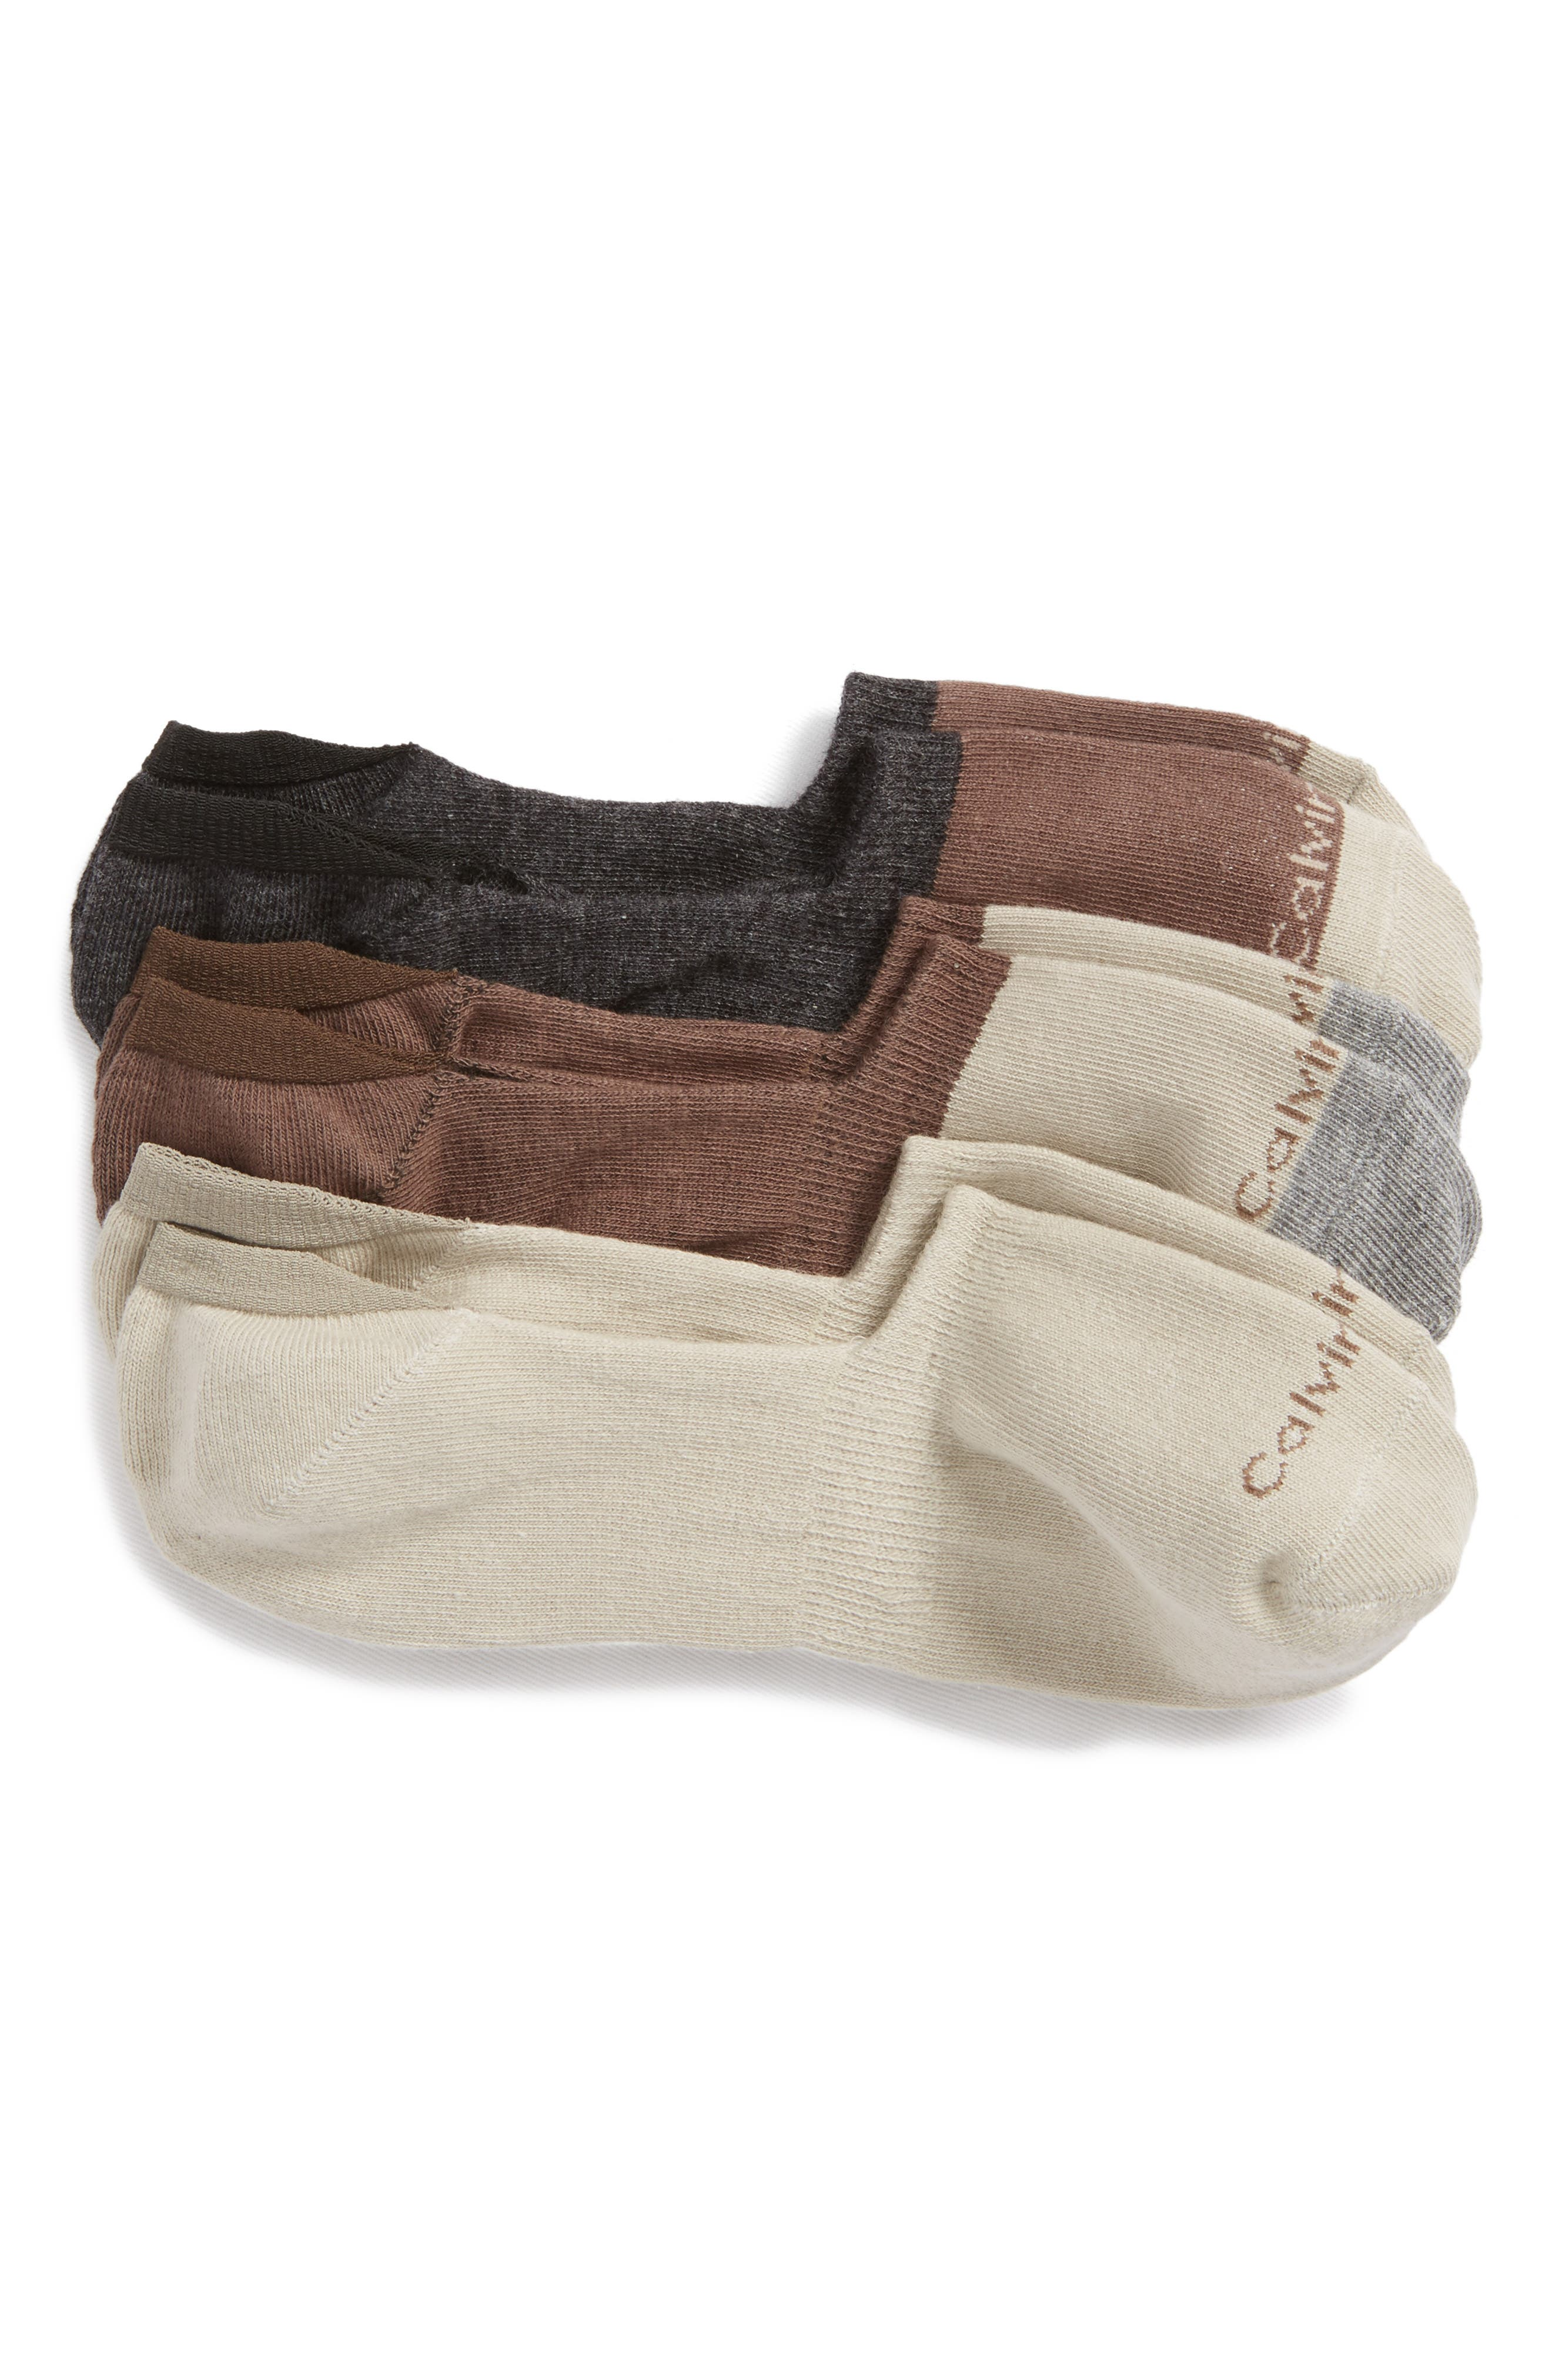 3-Pack No-Show Socks,                         Main,                         color, H60